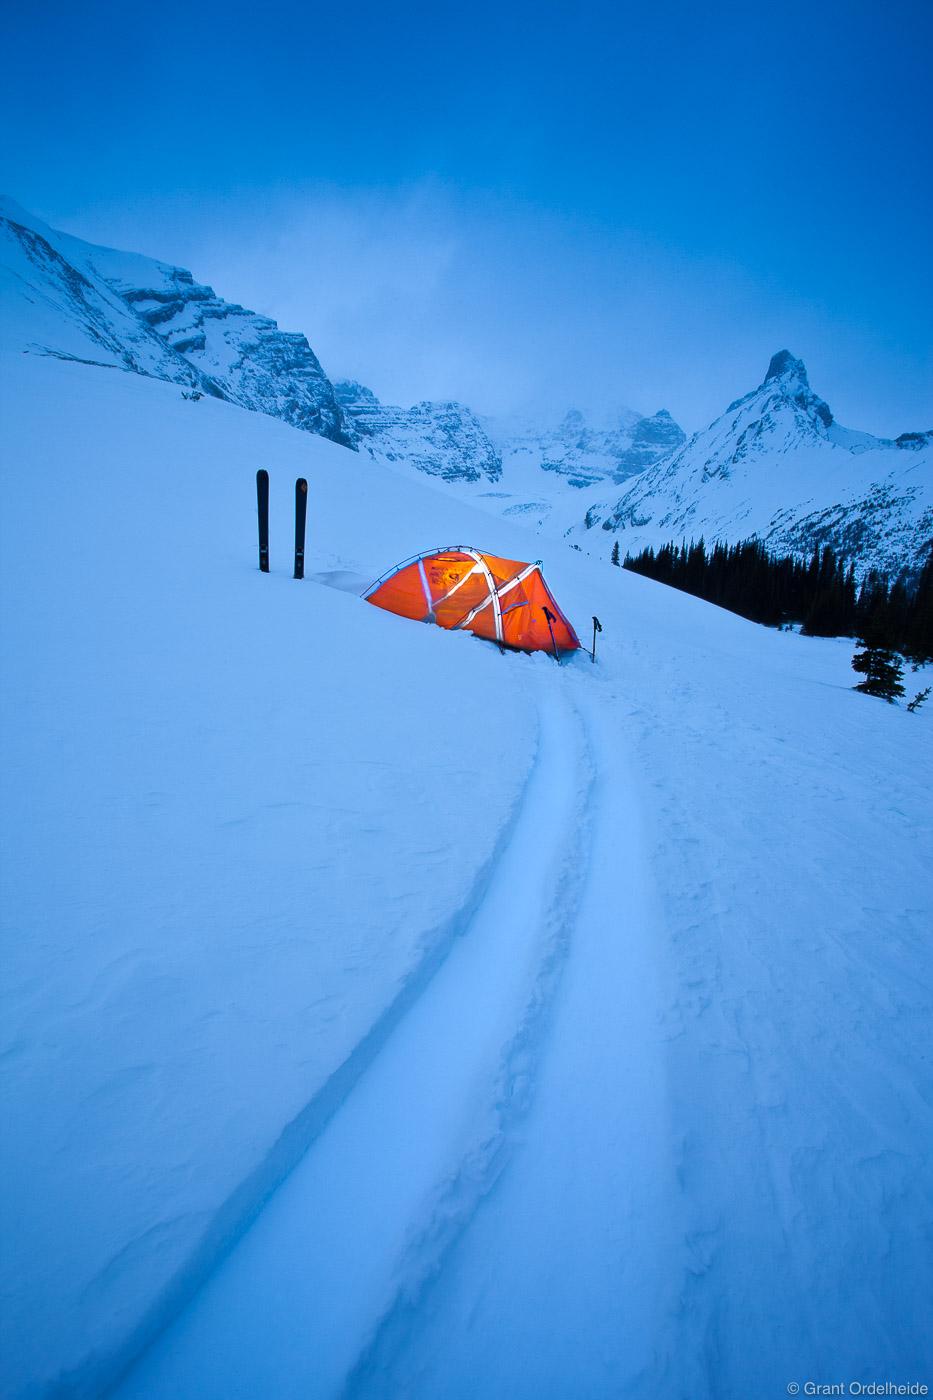 ski, touring, skis, illuminated, tent, mt. hilda, mt. athabasca, banff, national, park, alberta, canada, photo